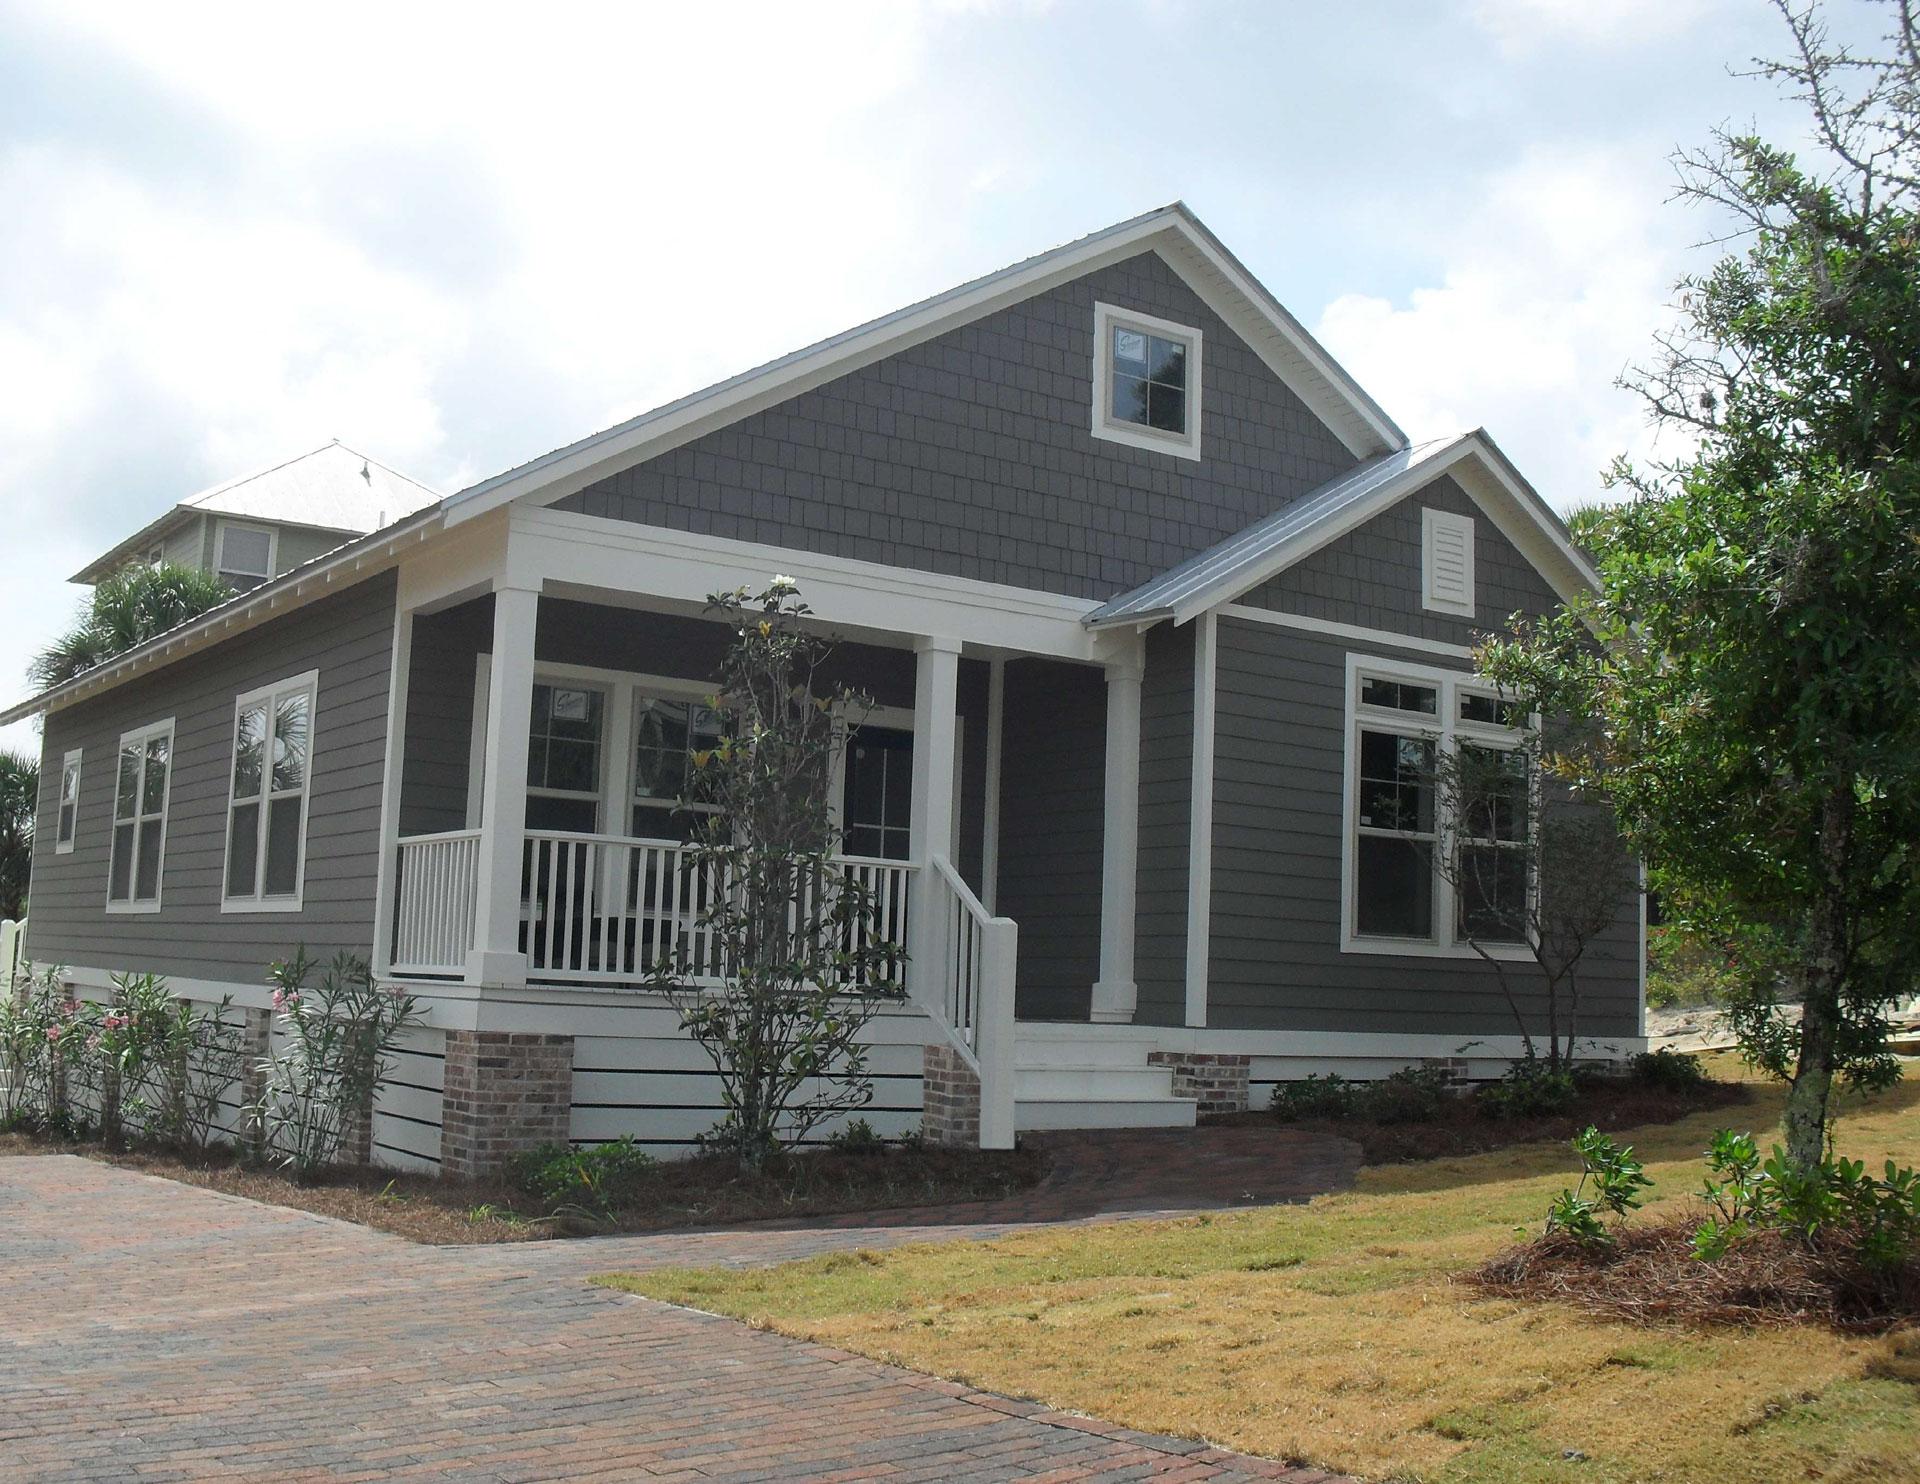 wickliffe modular home image